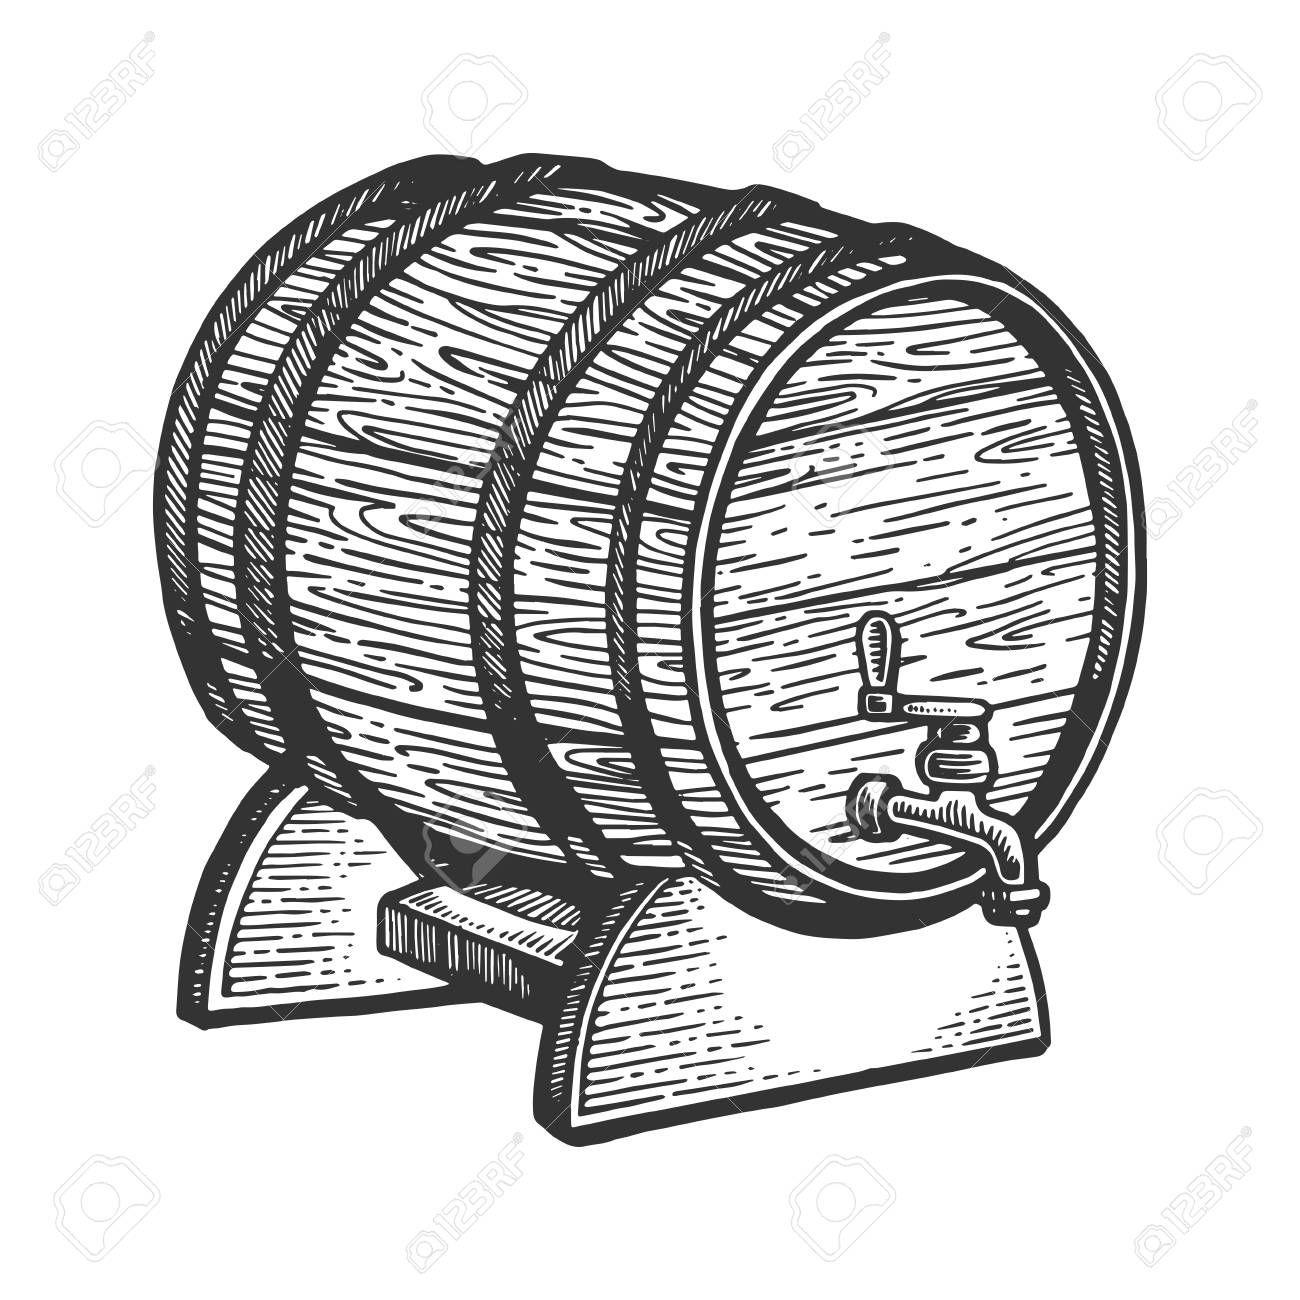 Wine Beer Barrel Engraving Vector Illustration Sponsored Barrel Beer Wine Illustration Vector Beer Barrel Beer Icon Engraving Illustration